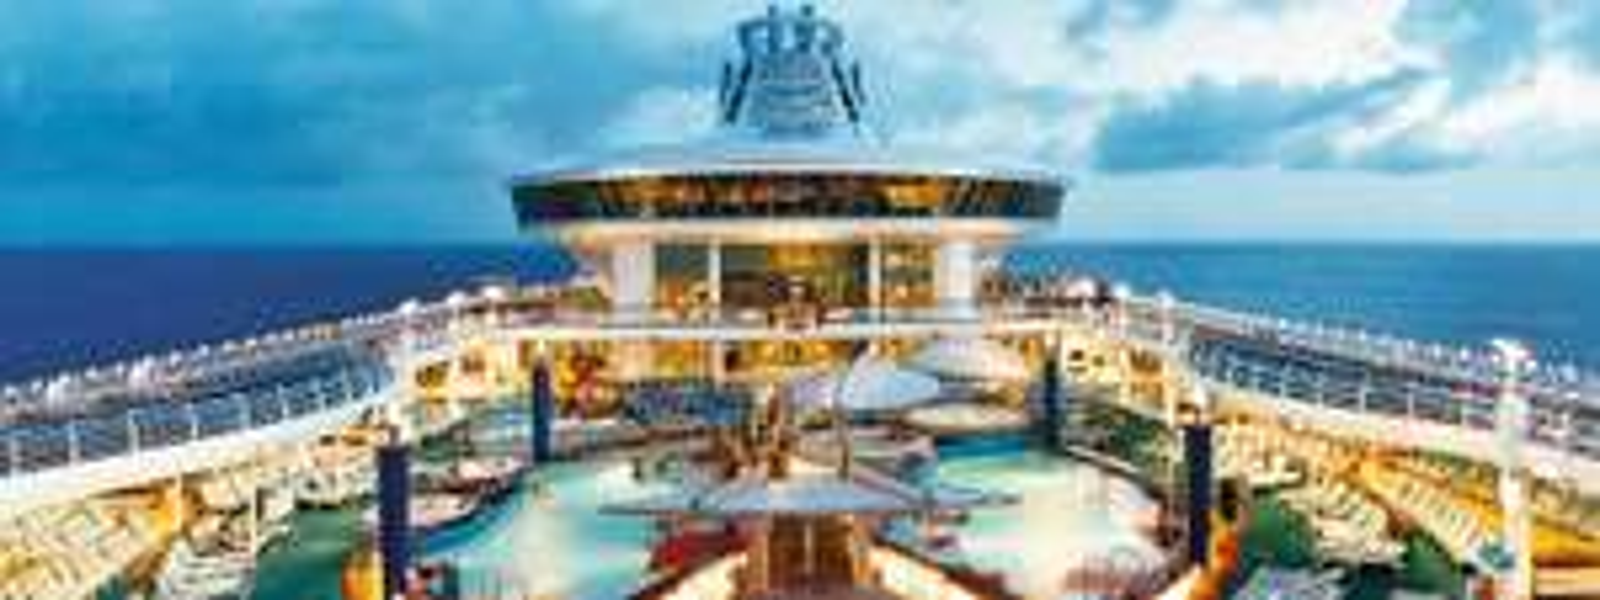 14 Night Transatlantic Cruise (Miami to Southampton) Aboard RCi Navigator Of The Seas - £1098 (£549 PP)